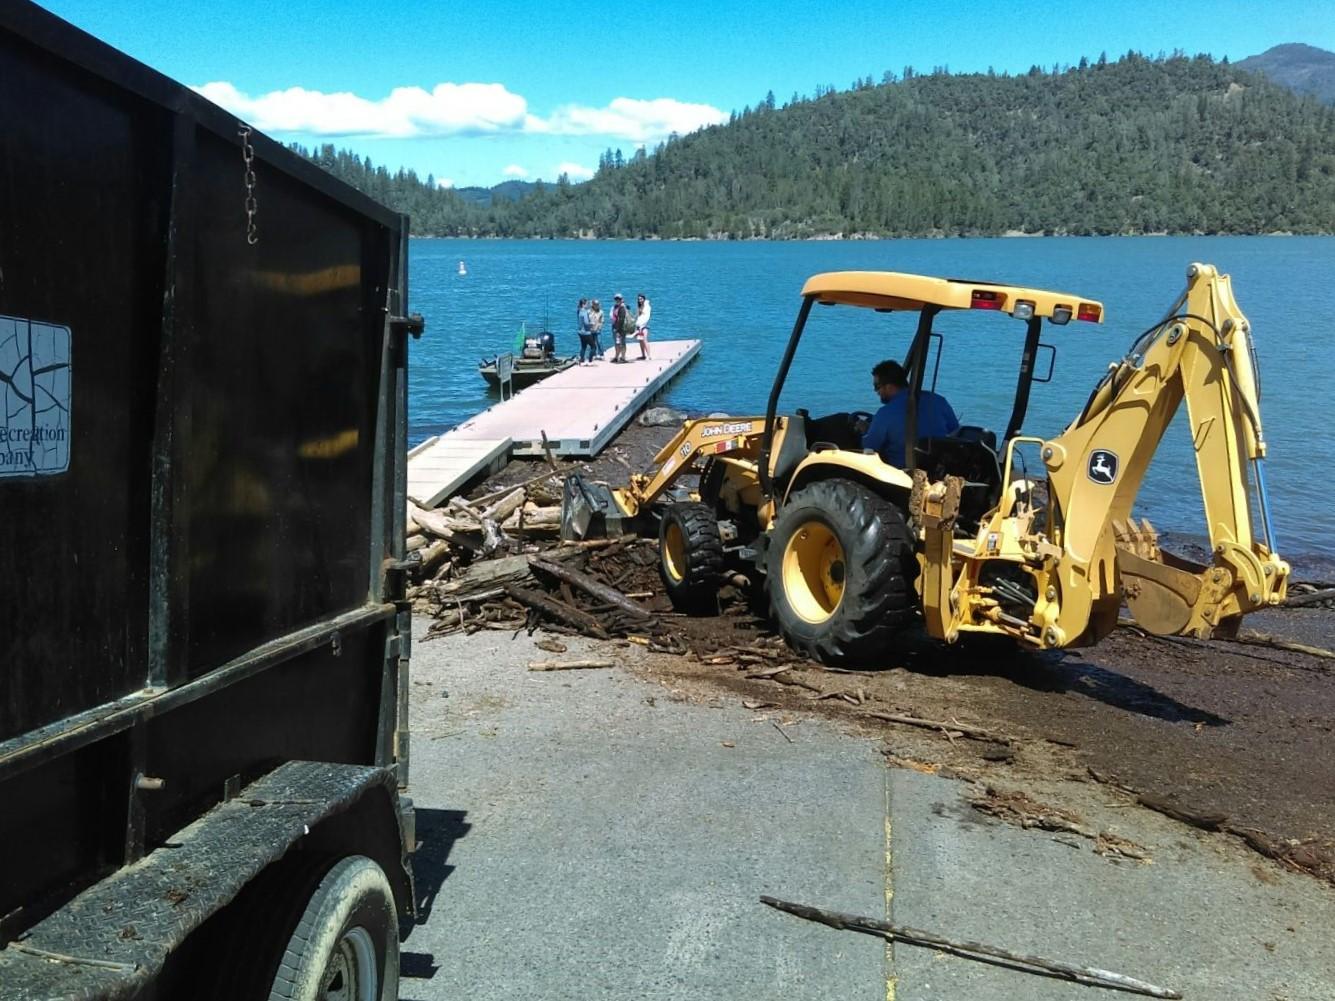 Shasta Recreation Company performing debris mitigation on Shasta Lake.